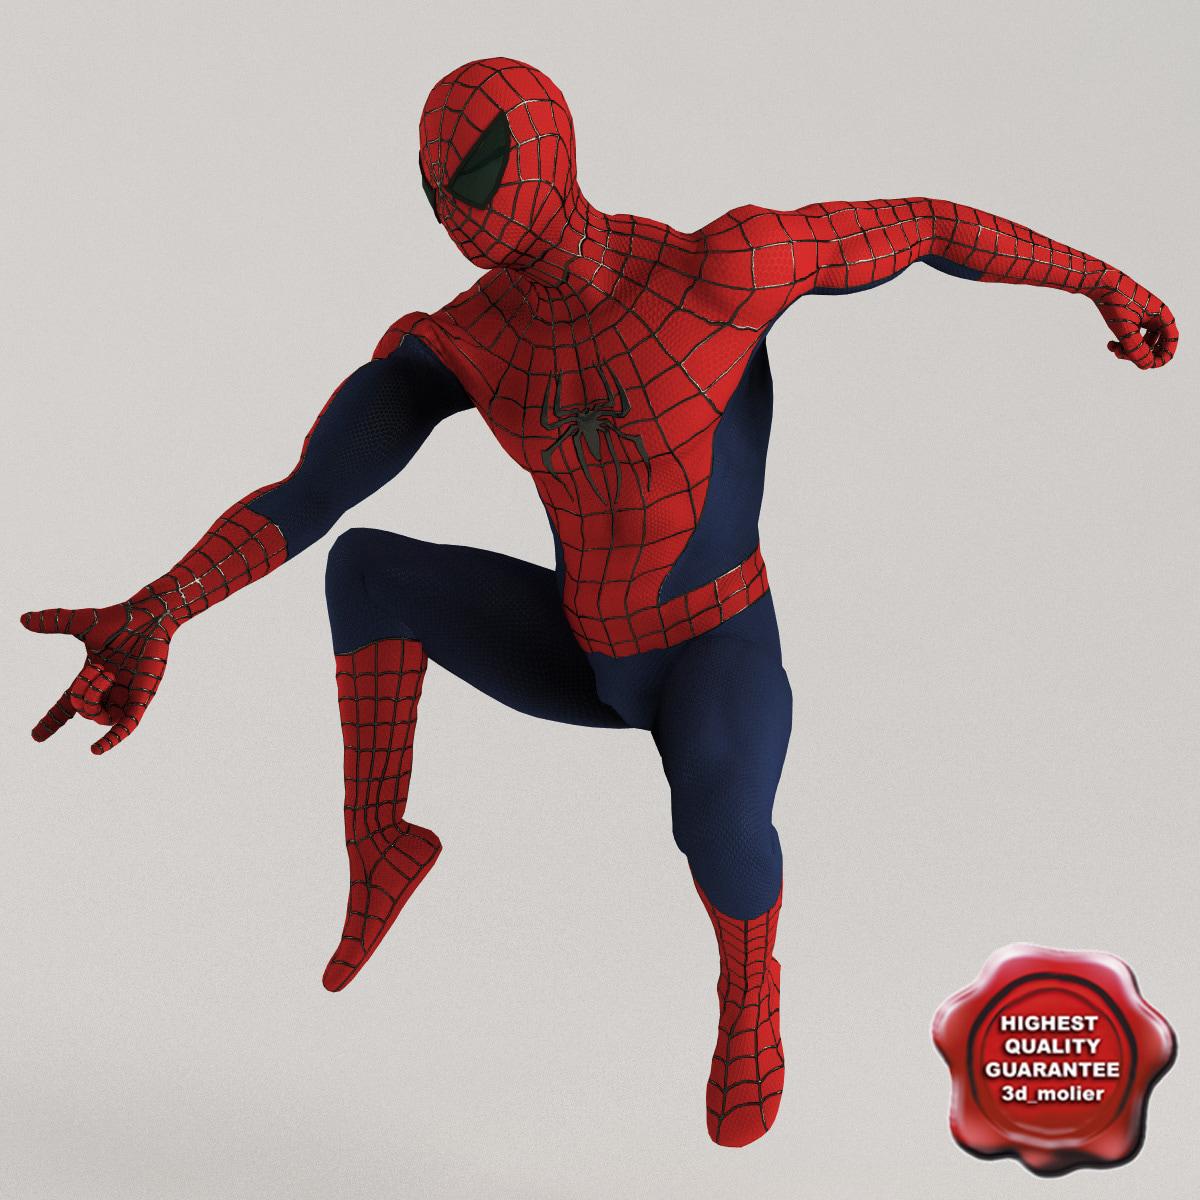 spiderman pose2 3d model